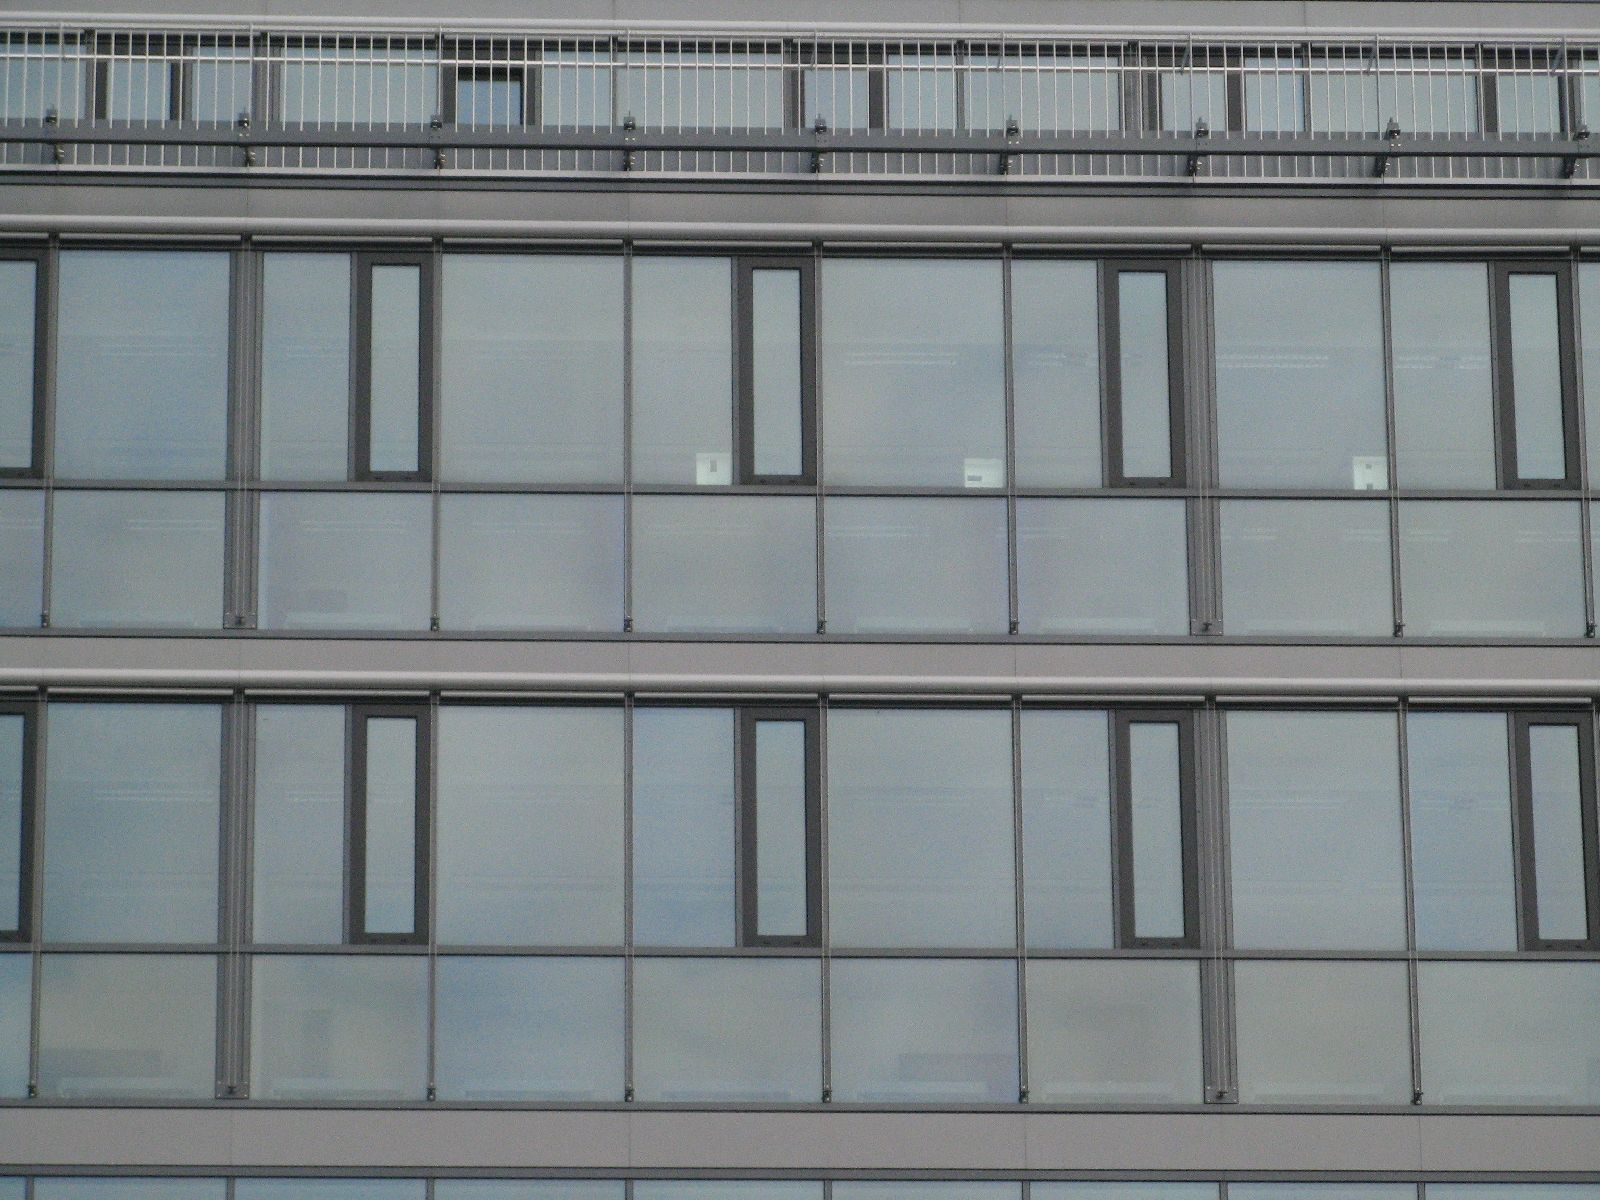 Gebaeude-Architektur_Textur_B_3610